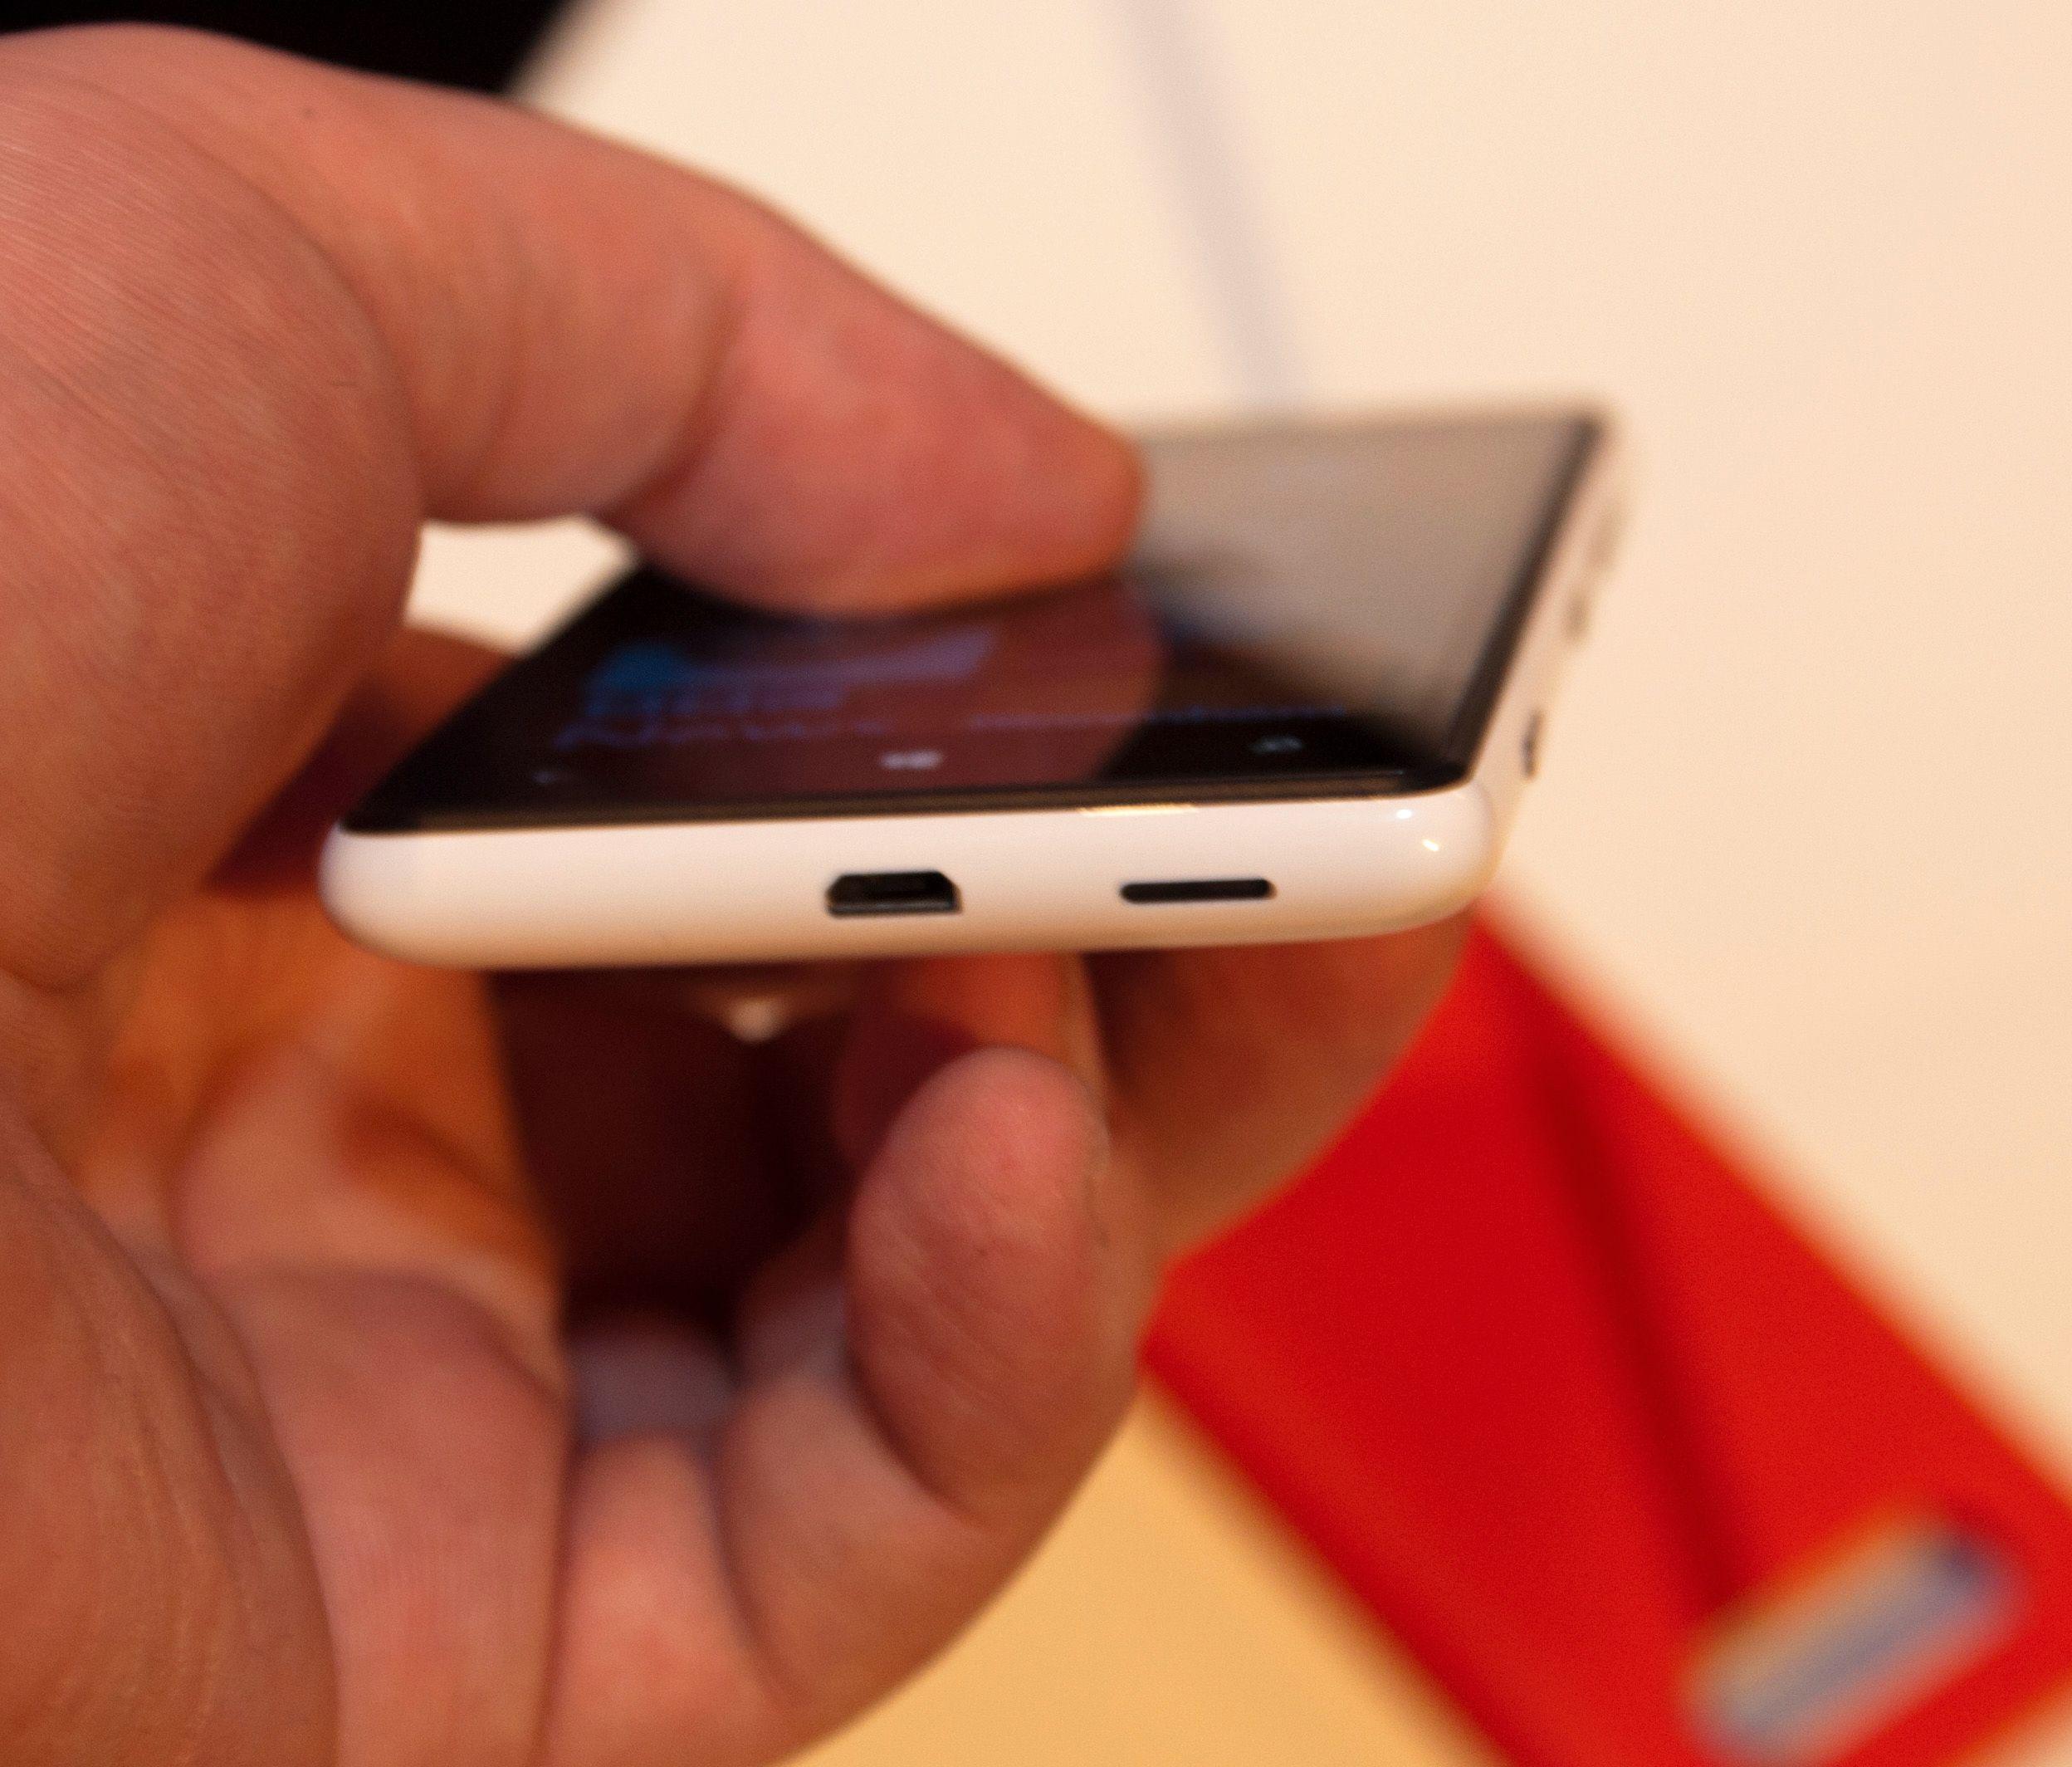 Micro-USB-kontakten sitter under telefonen.